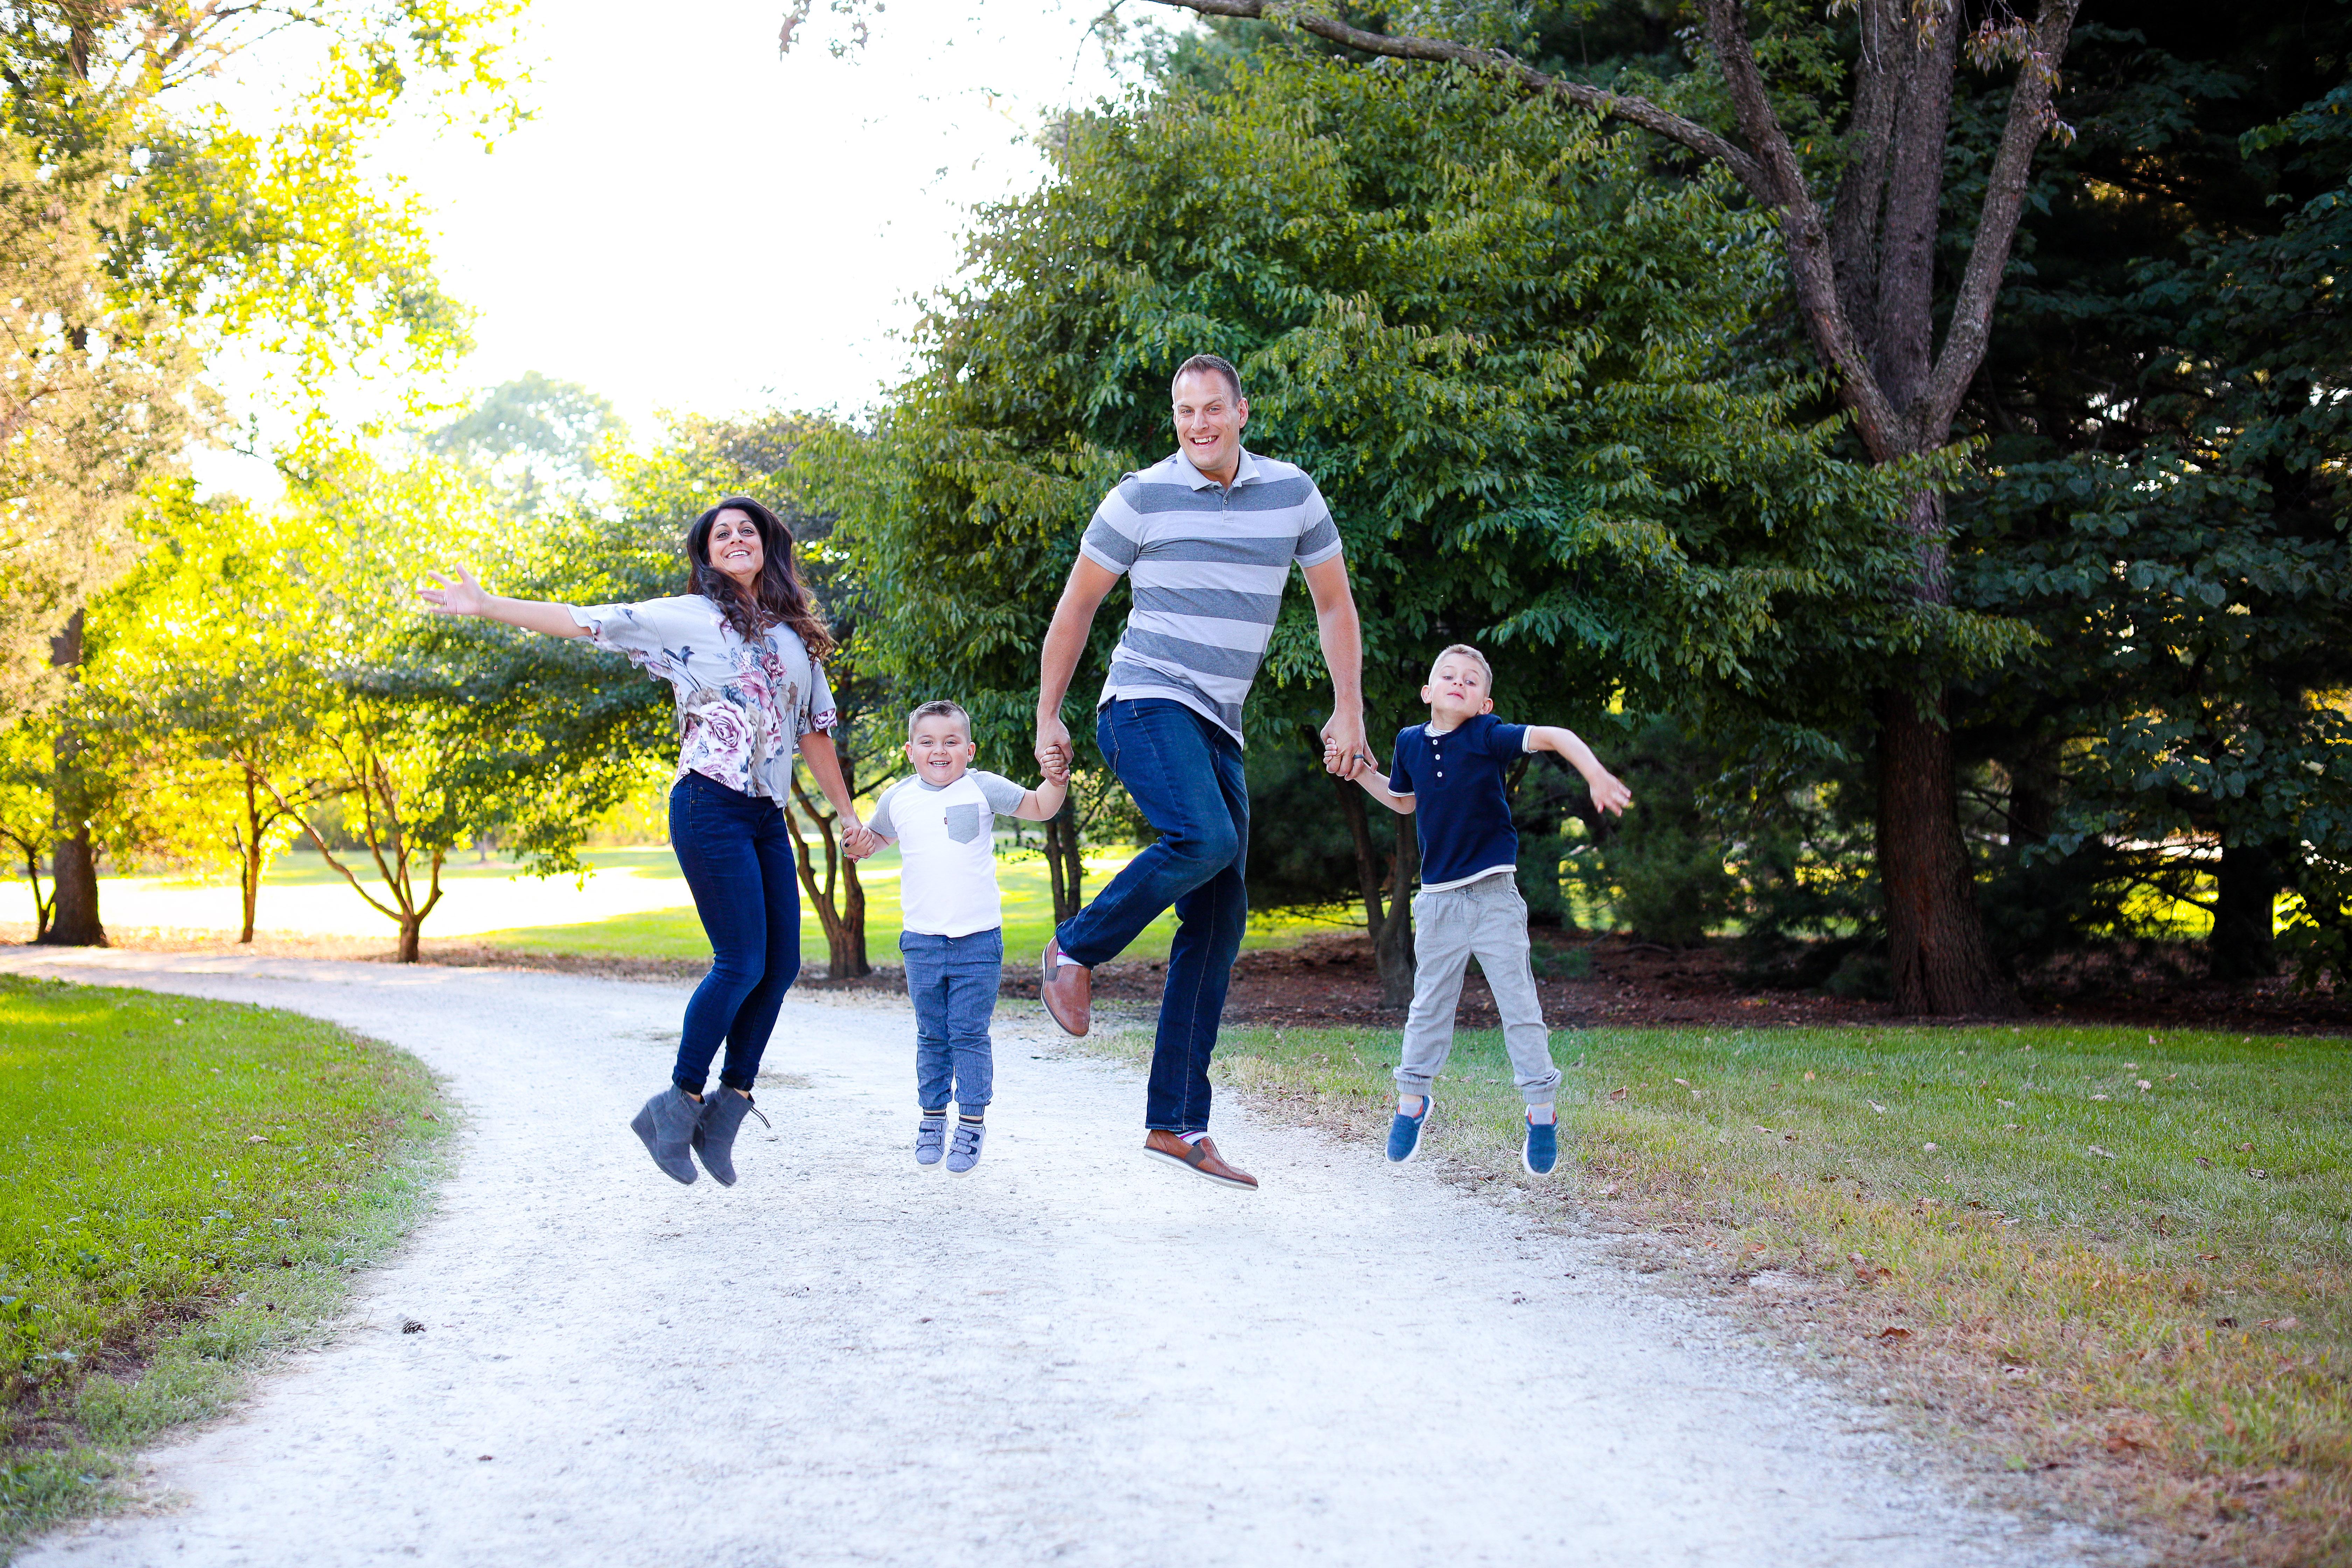 BecciHethcoatPhotography-Family Photographer-Wheaton-23.jpg